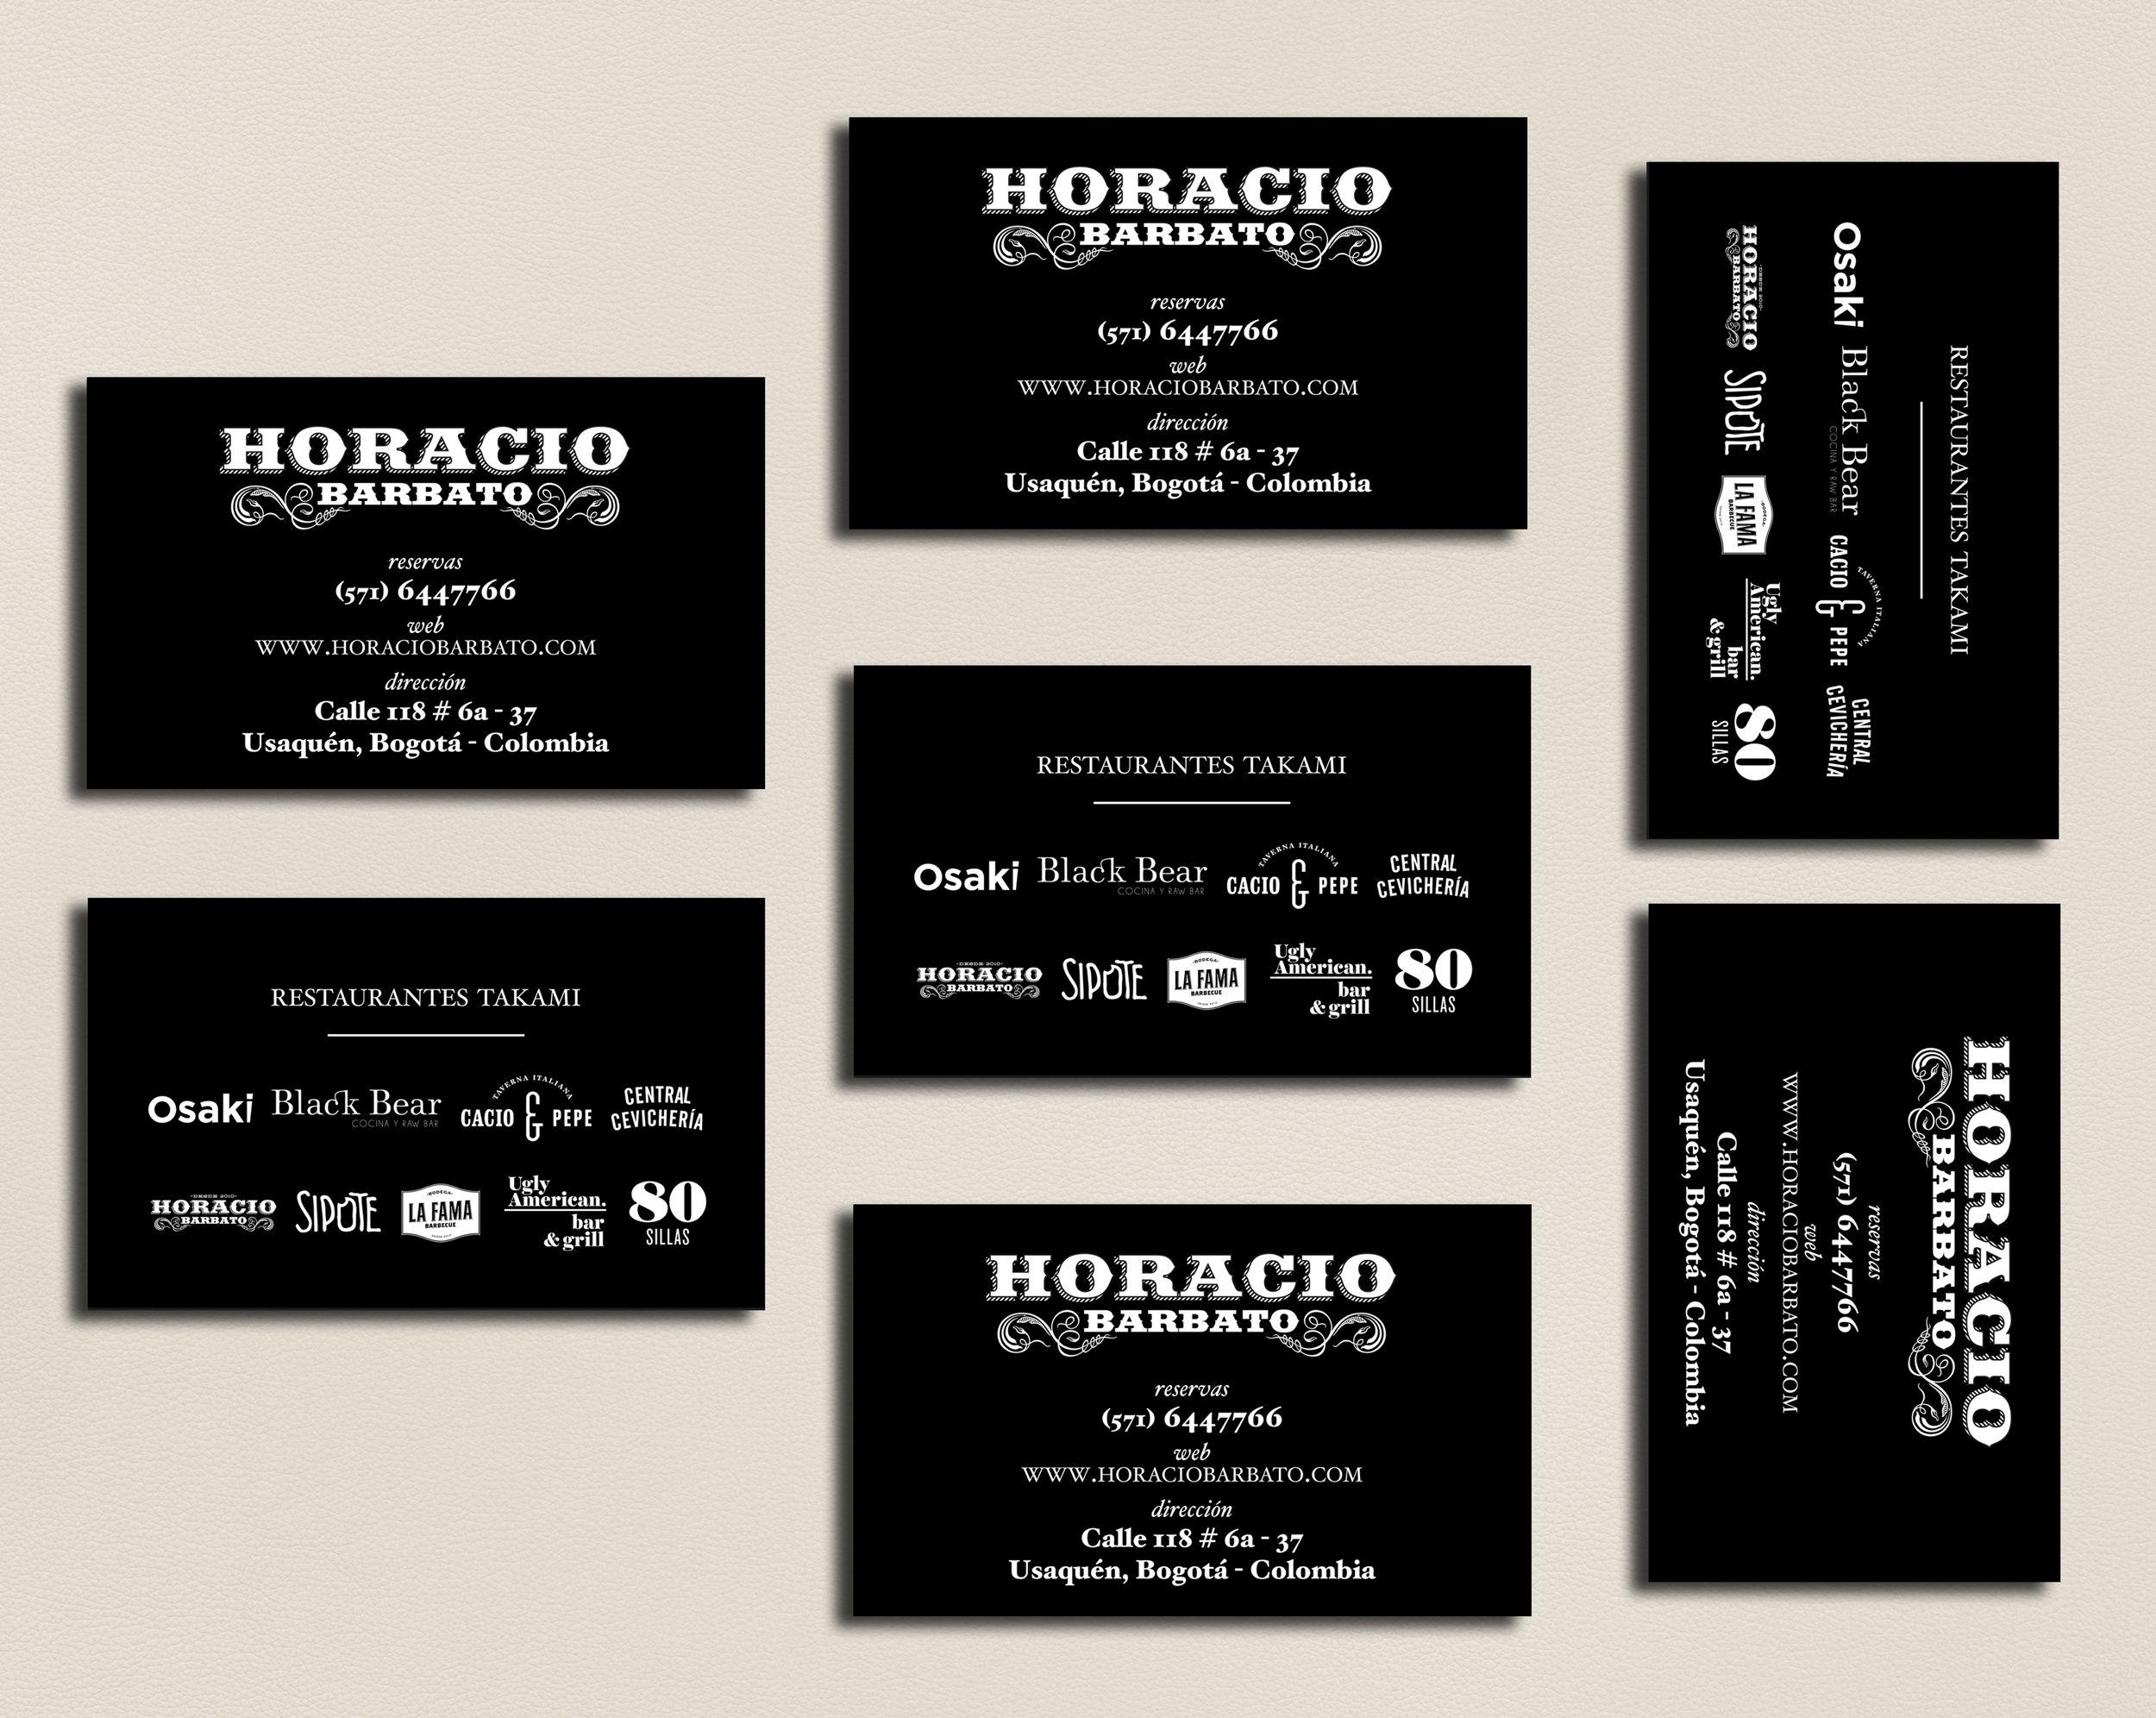 tarjetas de presentación para HORACIO BARBATO 1 tinta tiro / 1 tinta retiro / impresión screen. tinta polietileno / plike negro impreso por: www.eltigre.info